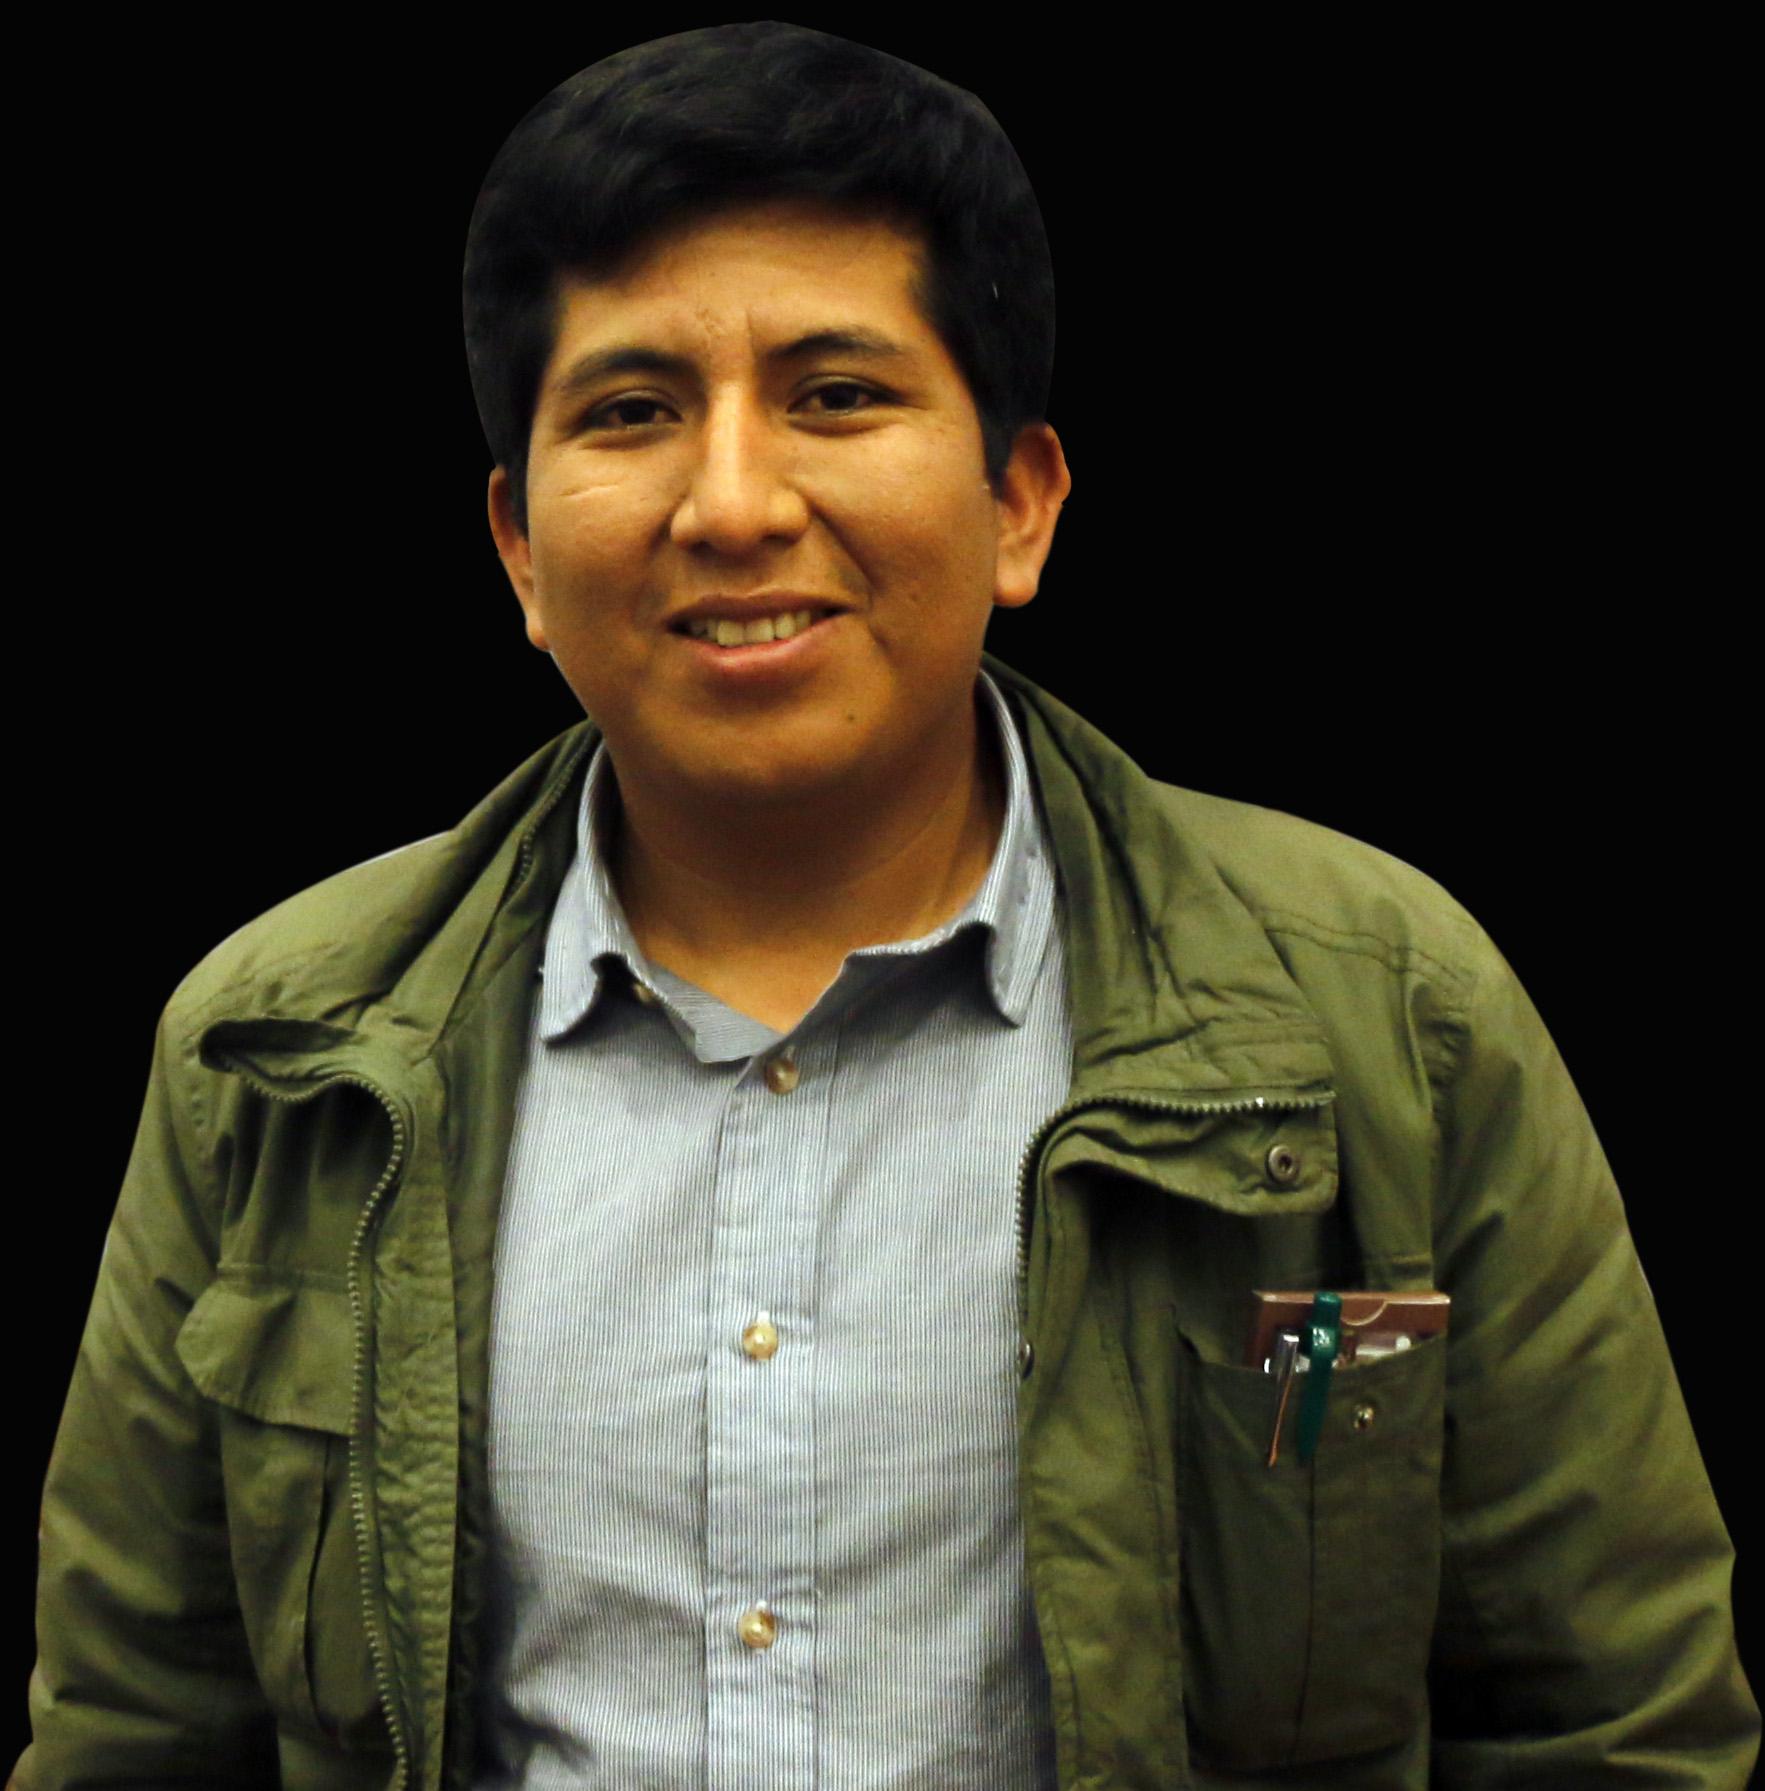 Fredy Yovera